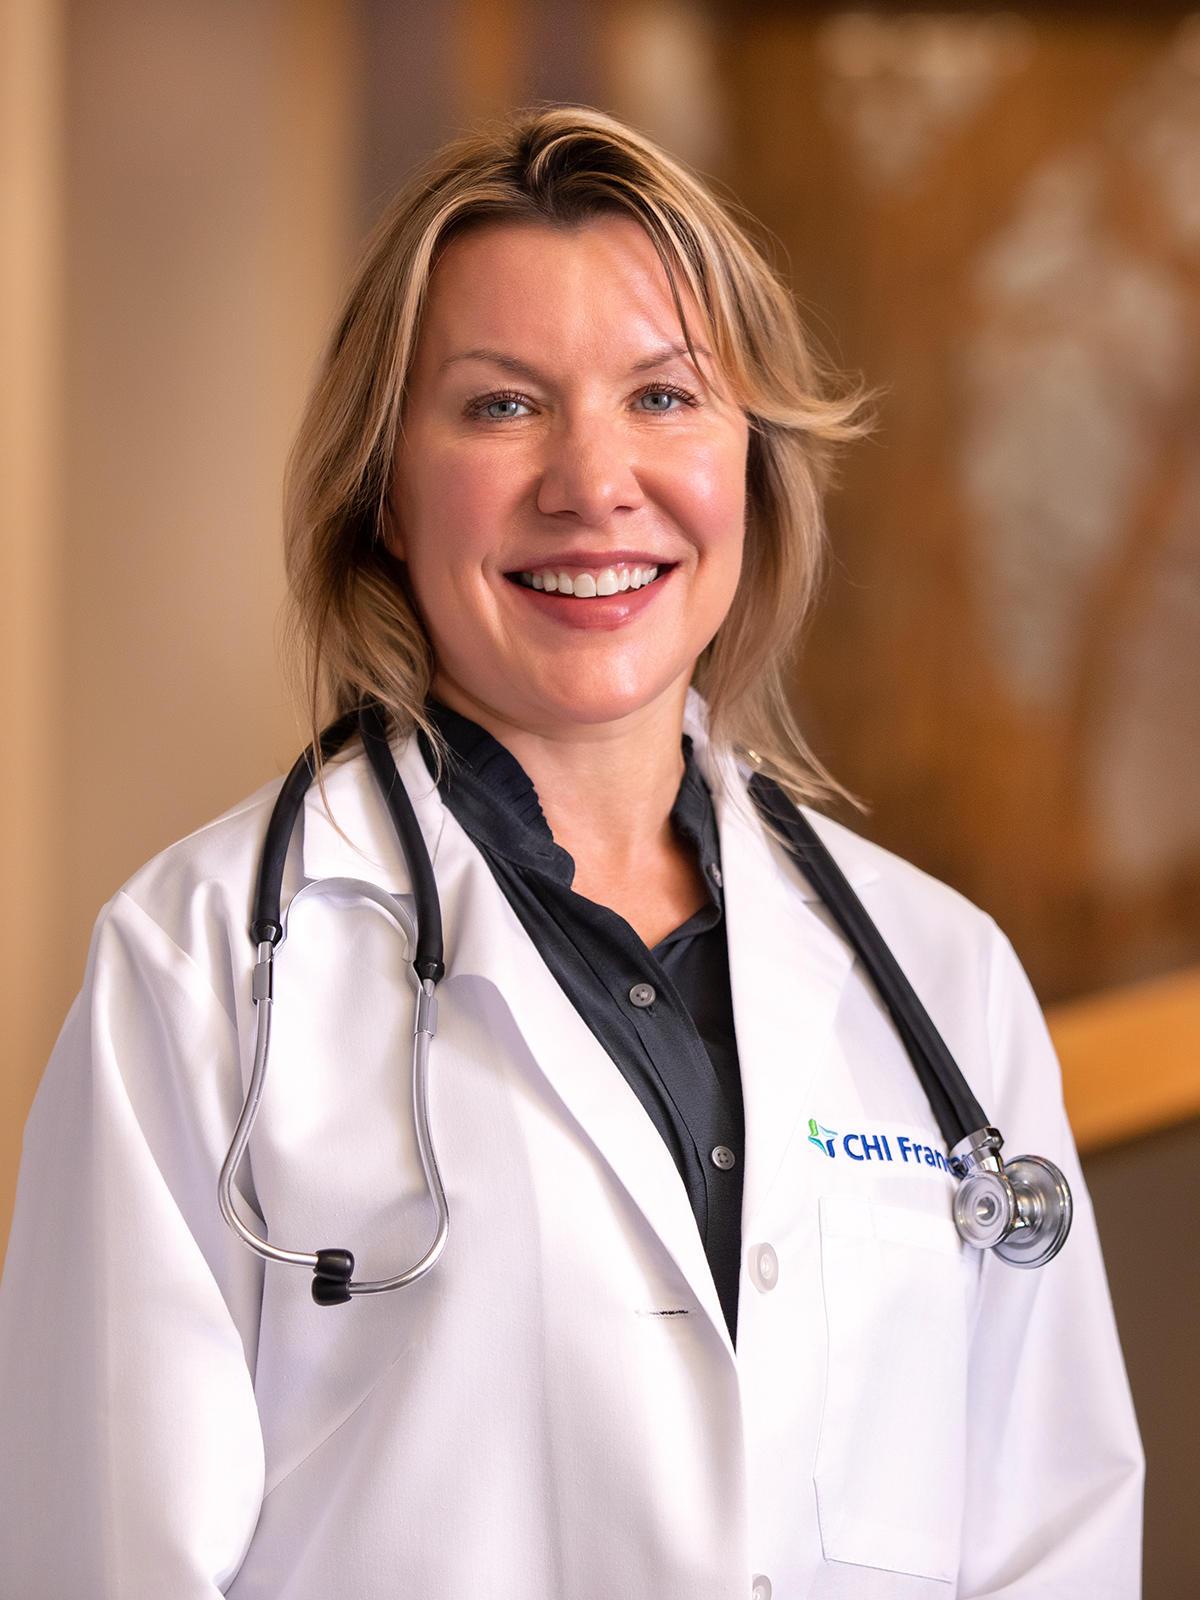 Kristin Lee, MD